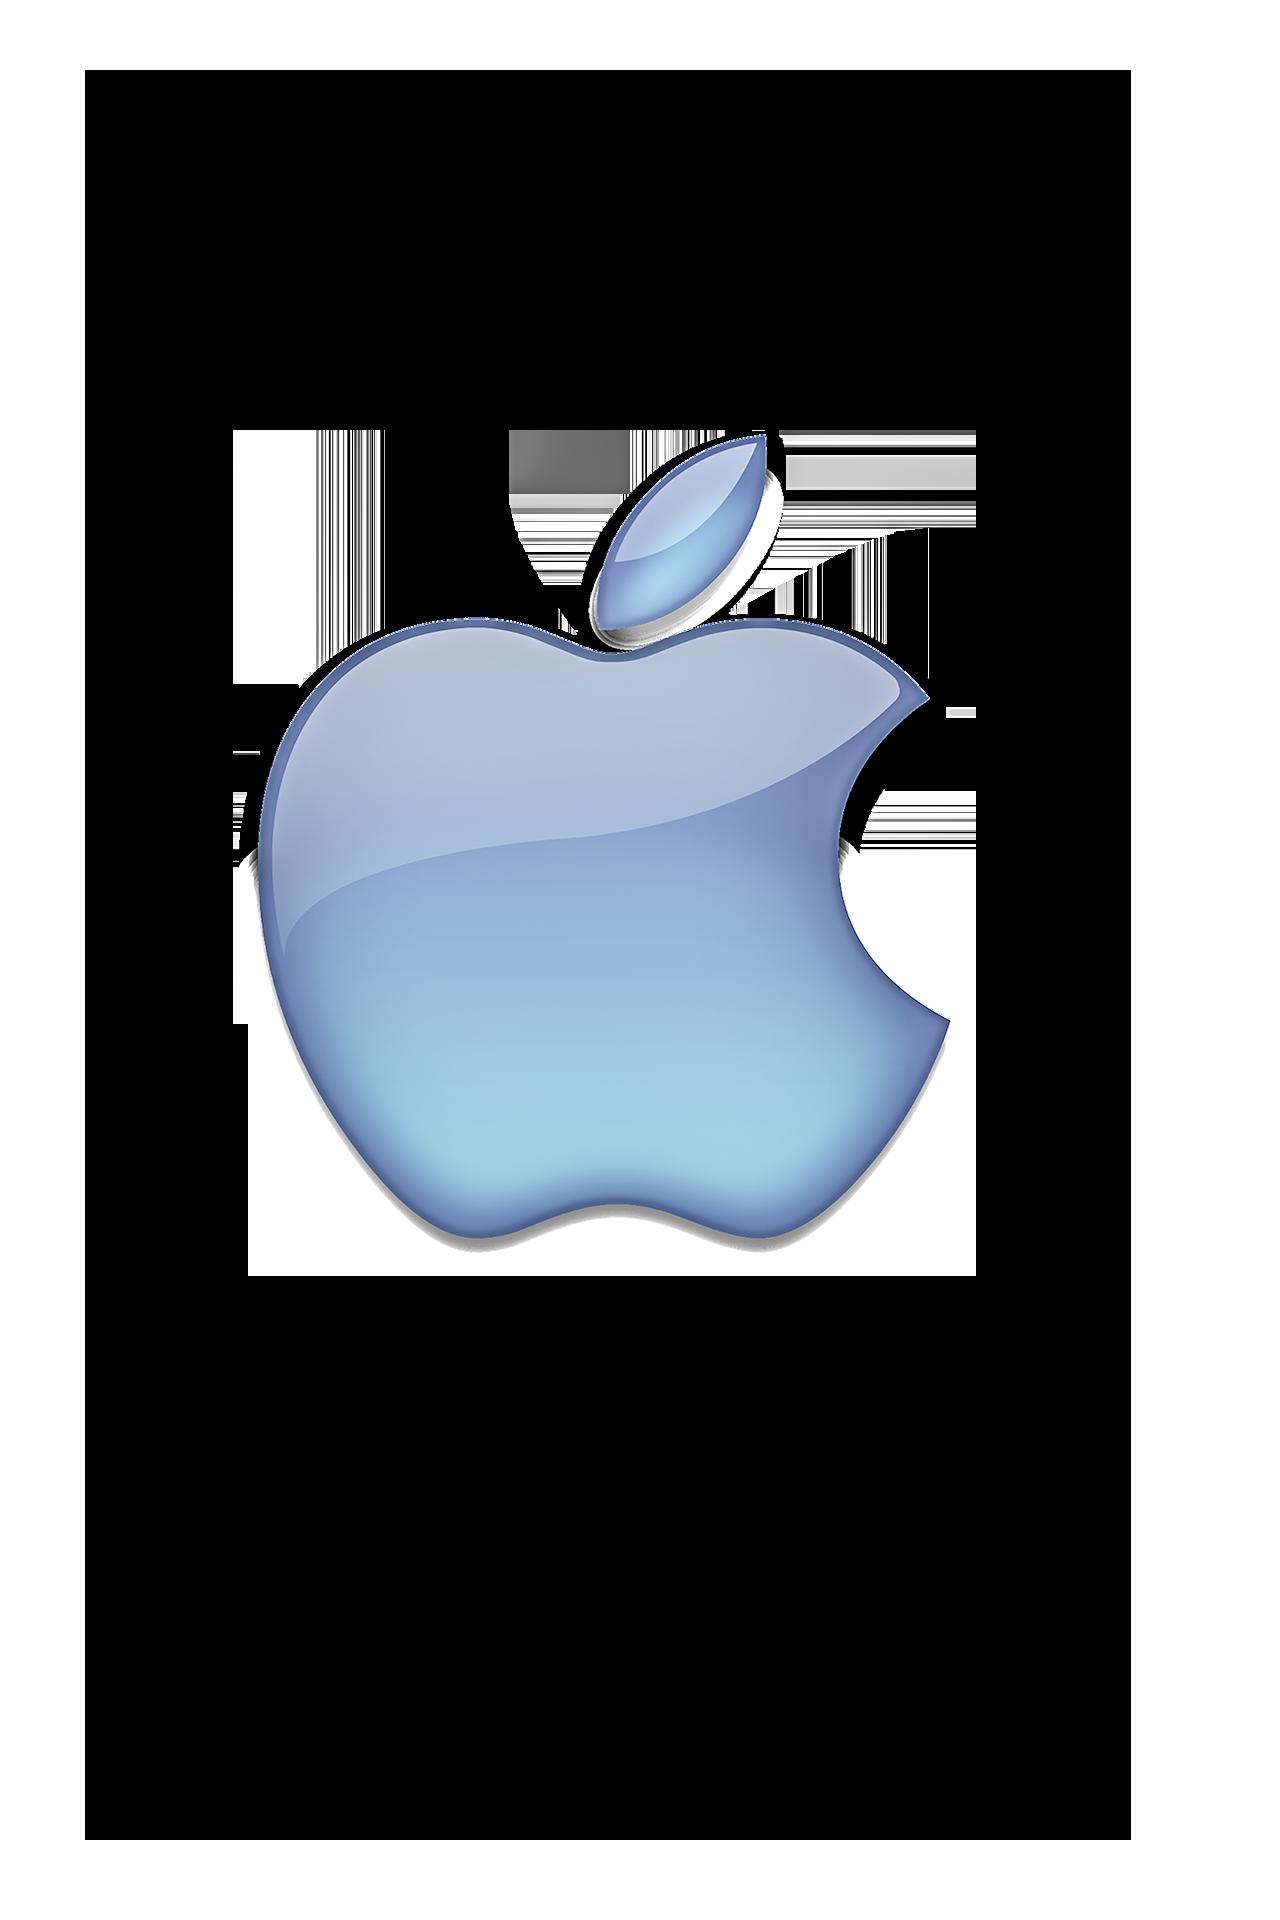 iPhone mobil logo